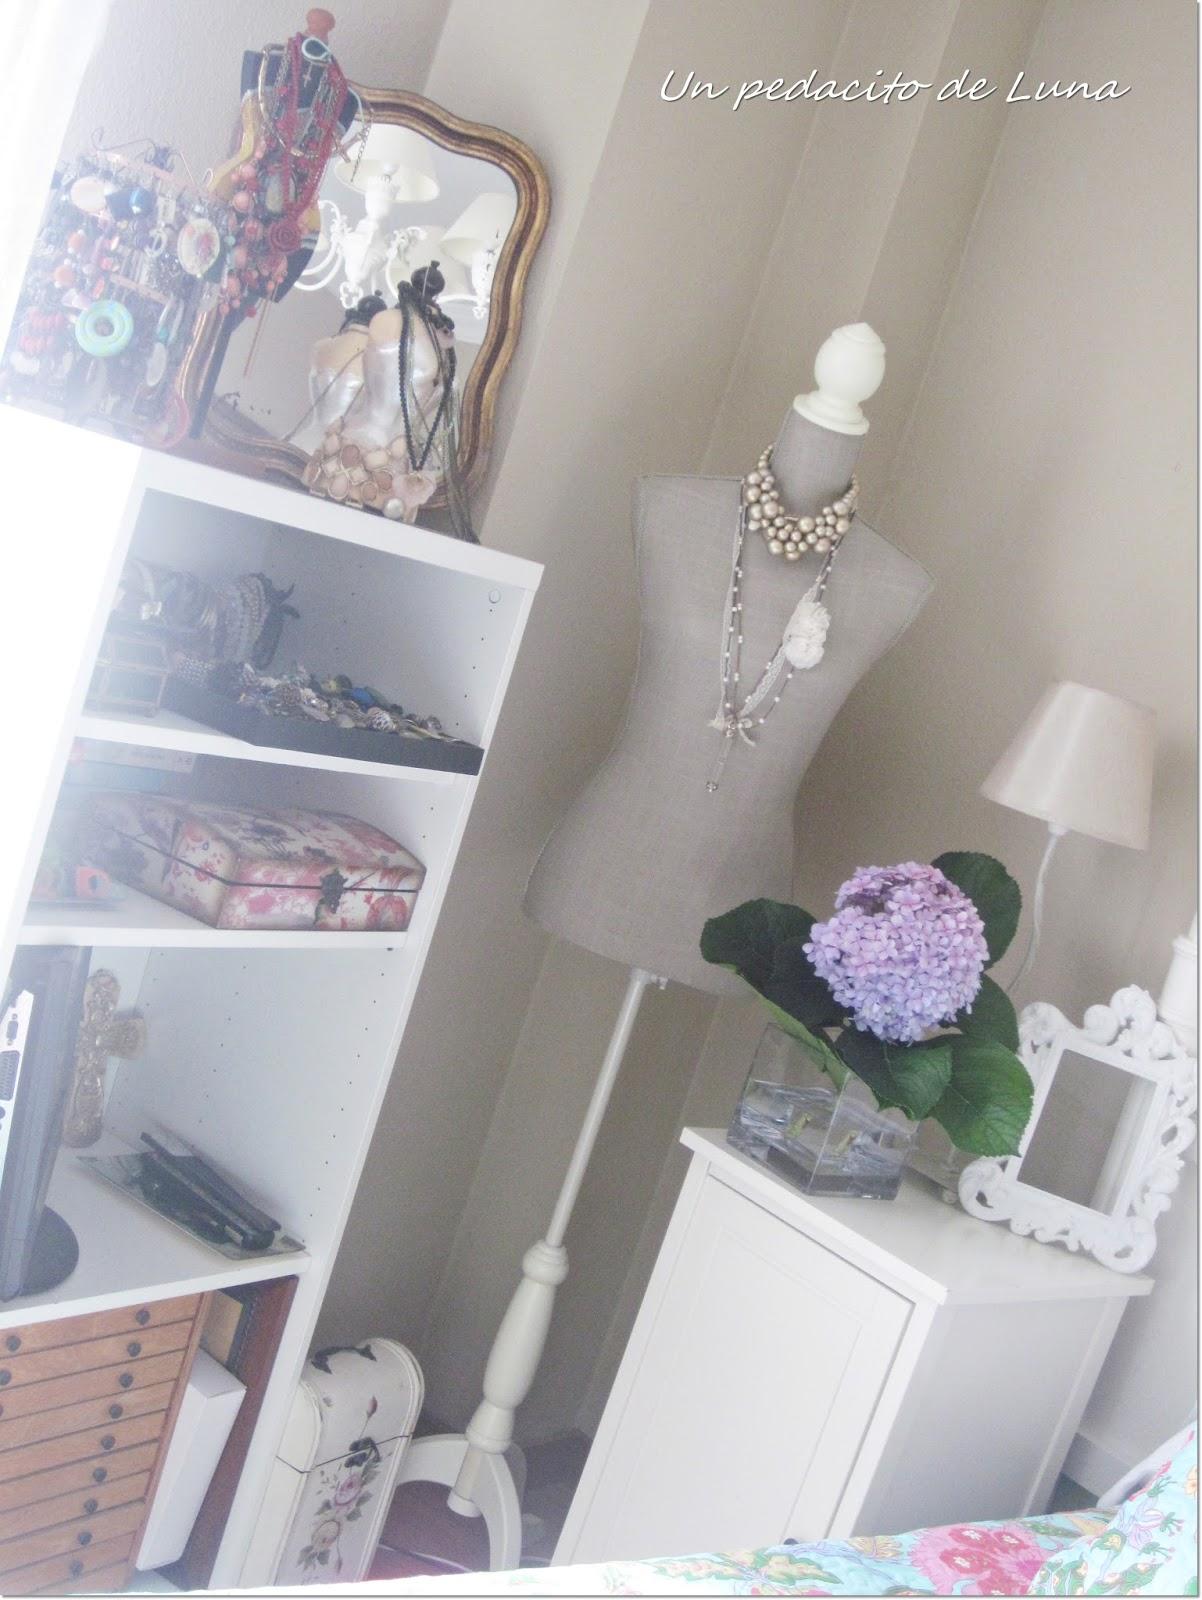 Agosto 2013 trocito de luna at home for Decoracion ropa de cama